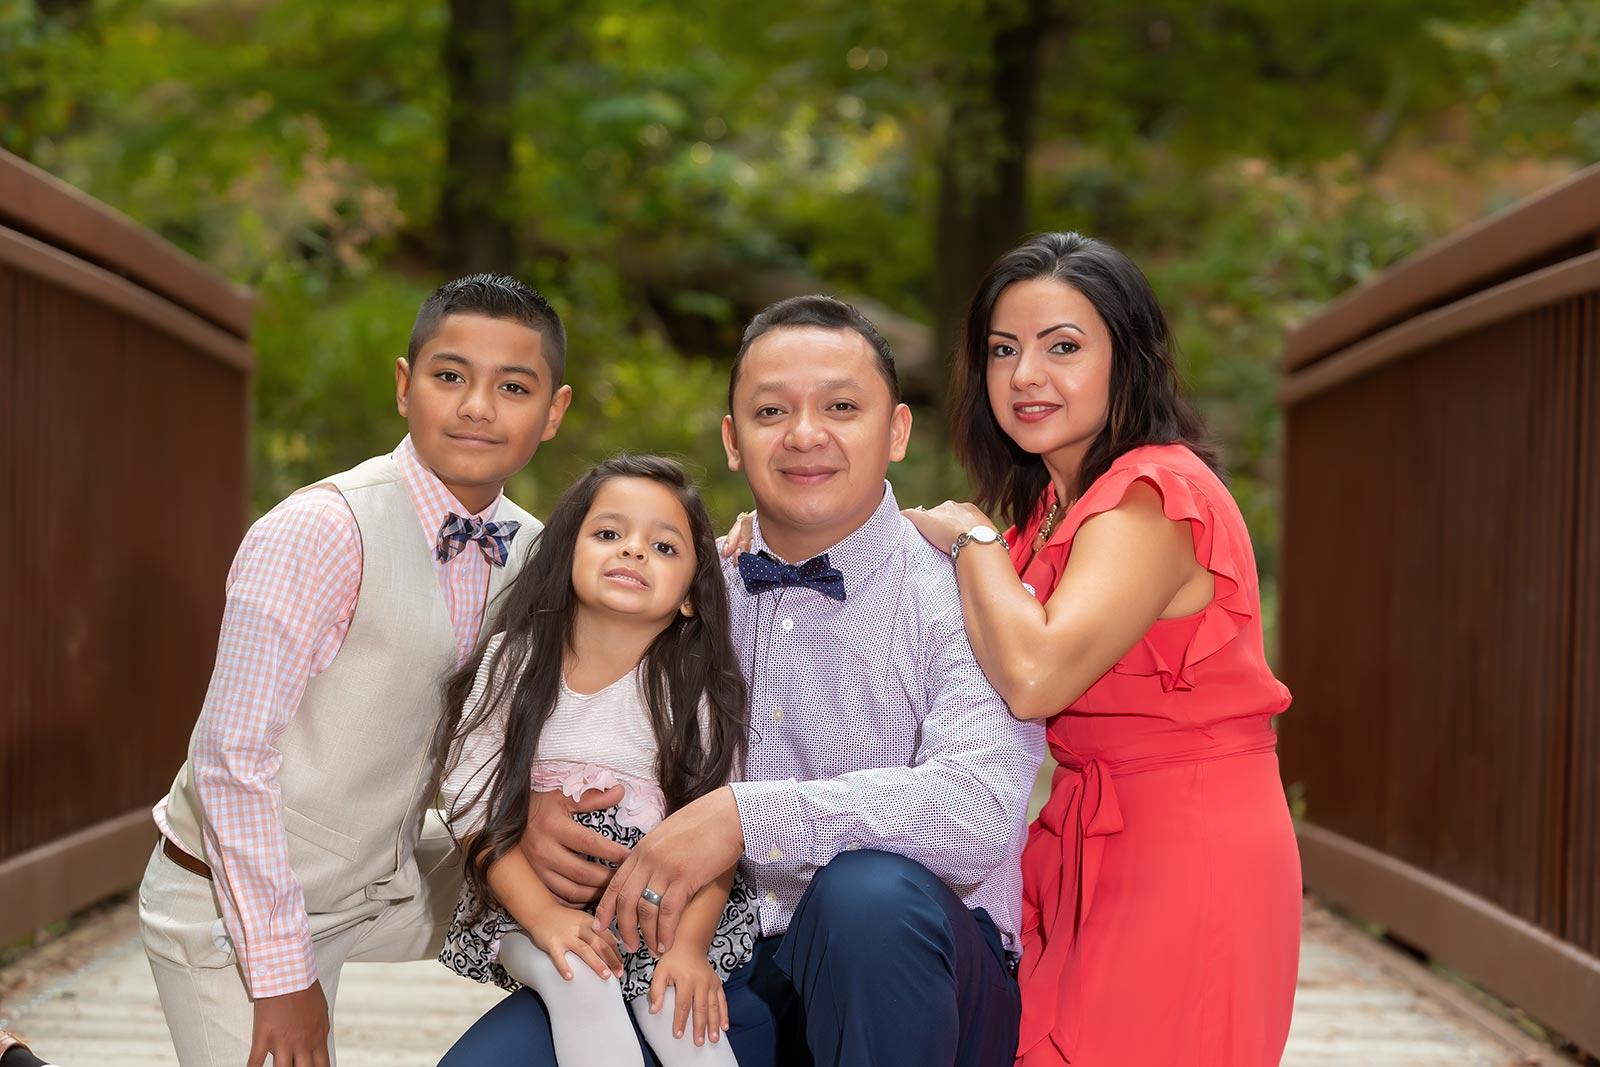 Lifestyle family photography at the Green Spring Gardens, Alexandria VA